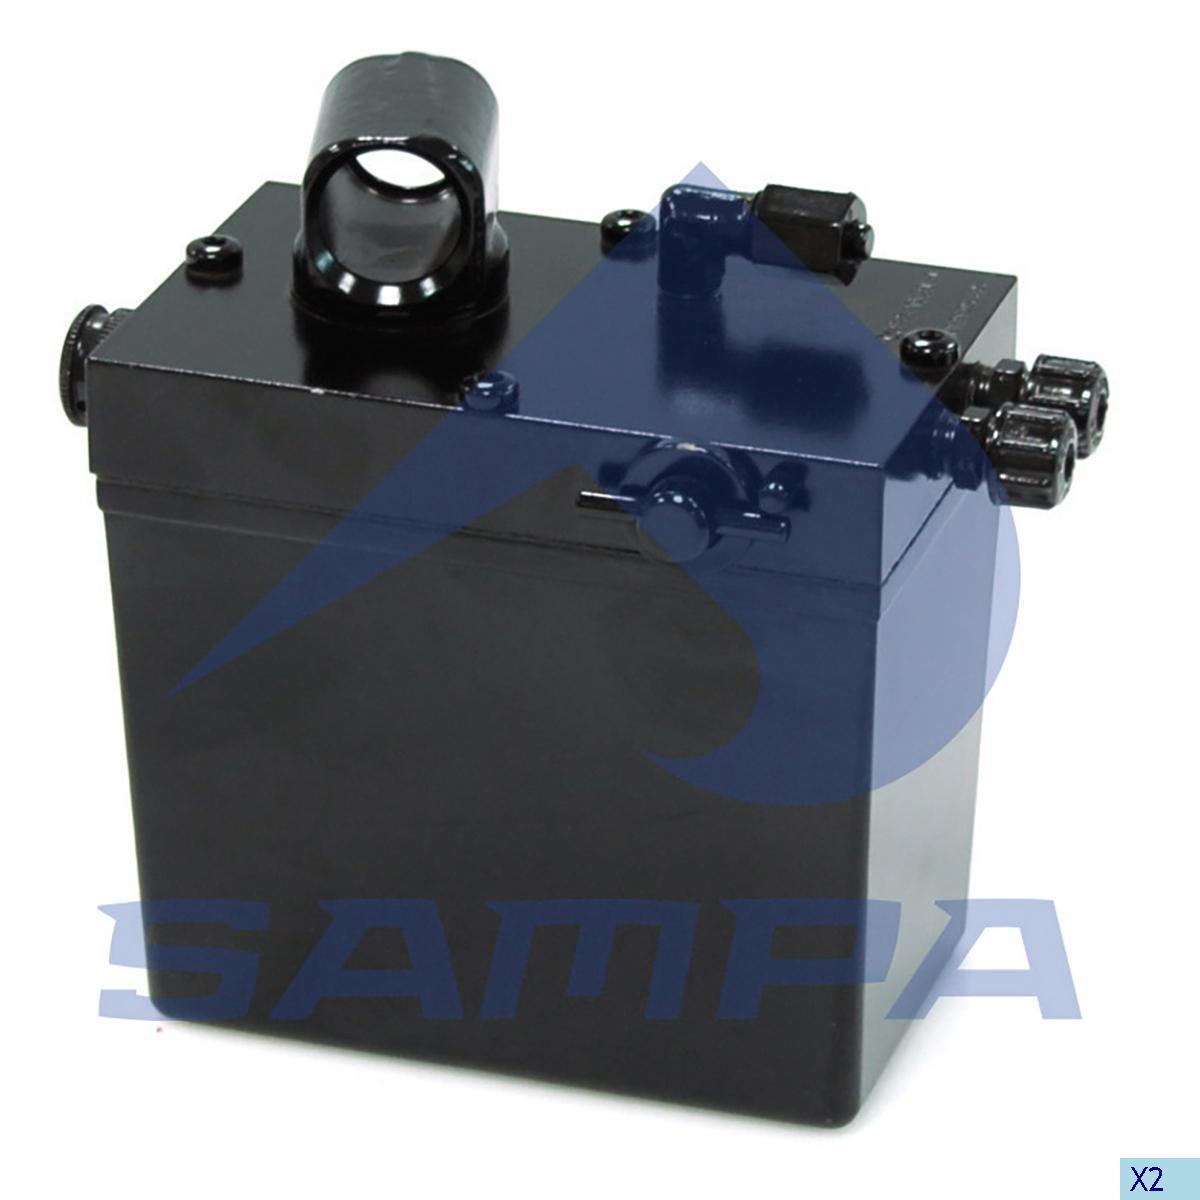 Hand Pump, Cab Tilt, Iveco, Cab